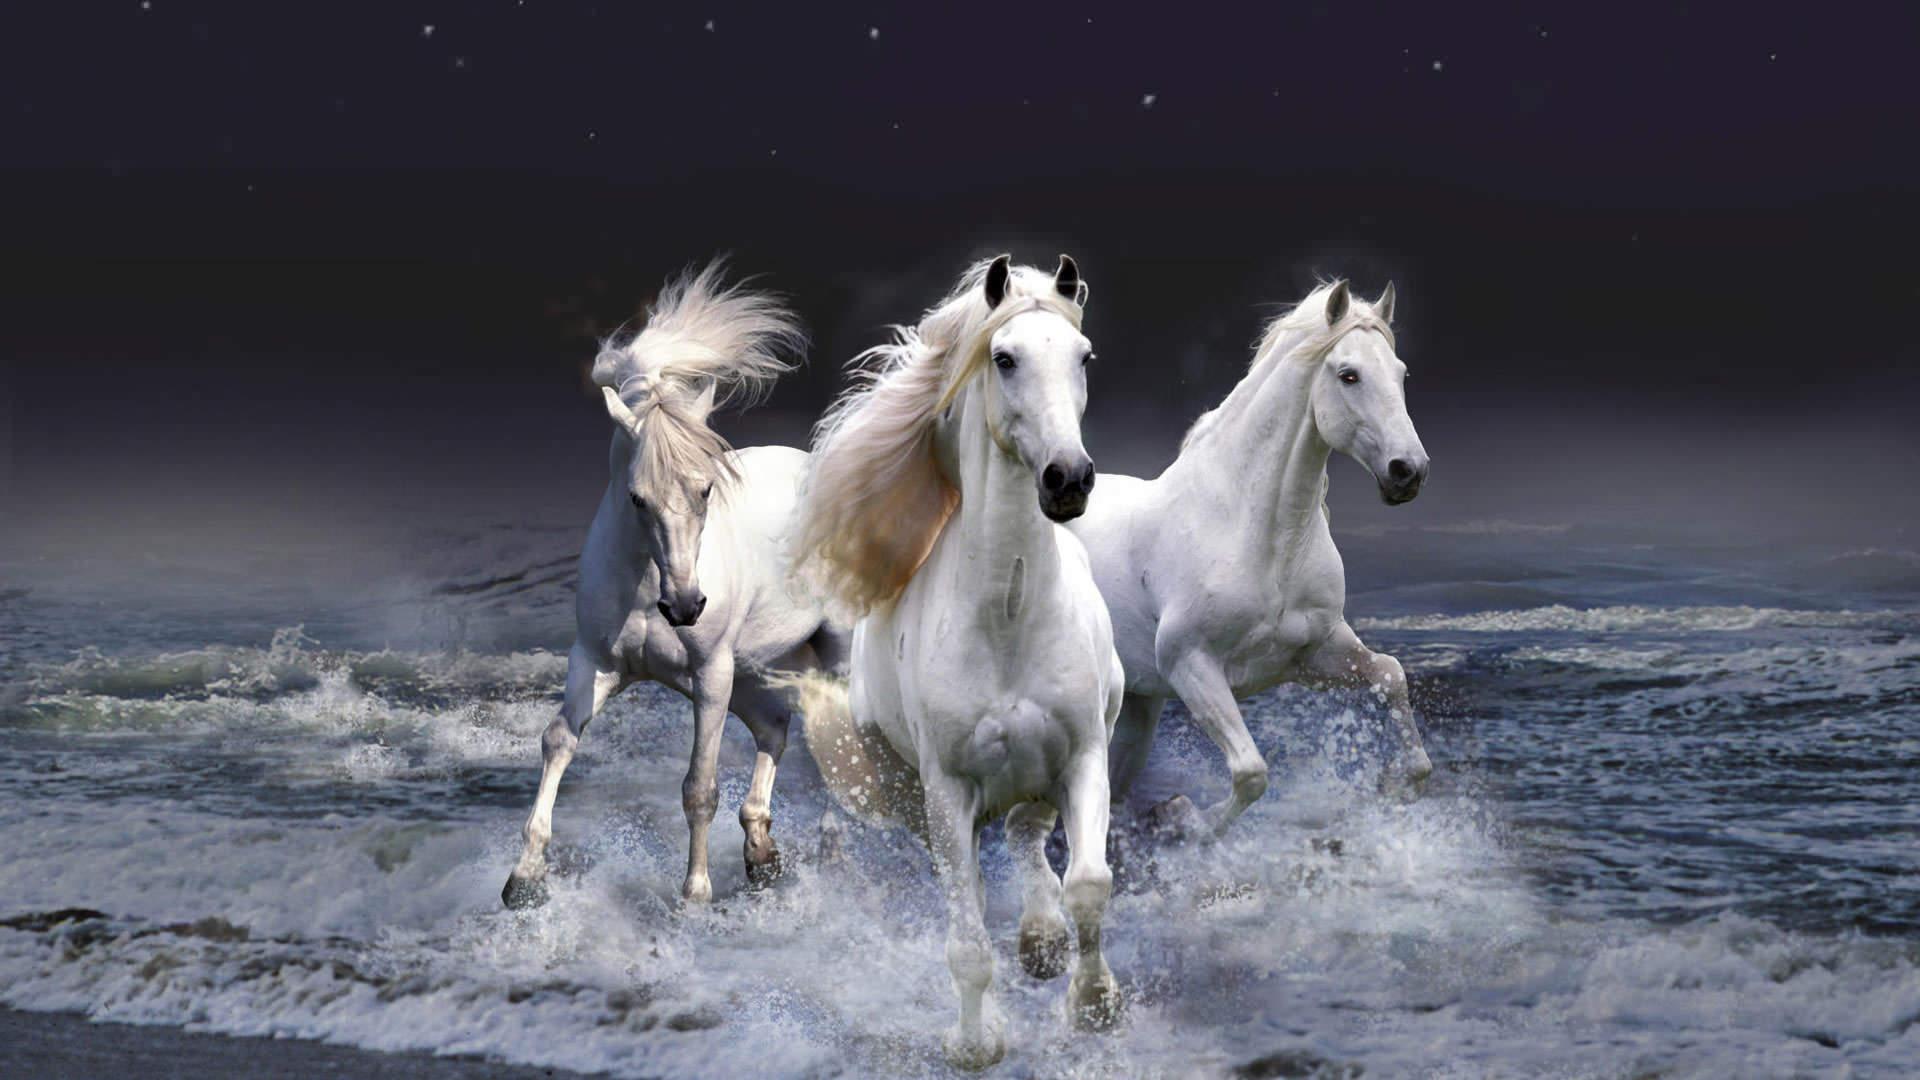 beautiful white wallpaper,horse,mammal,mane,stallion,mustang horse